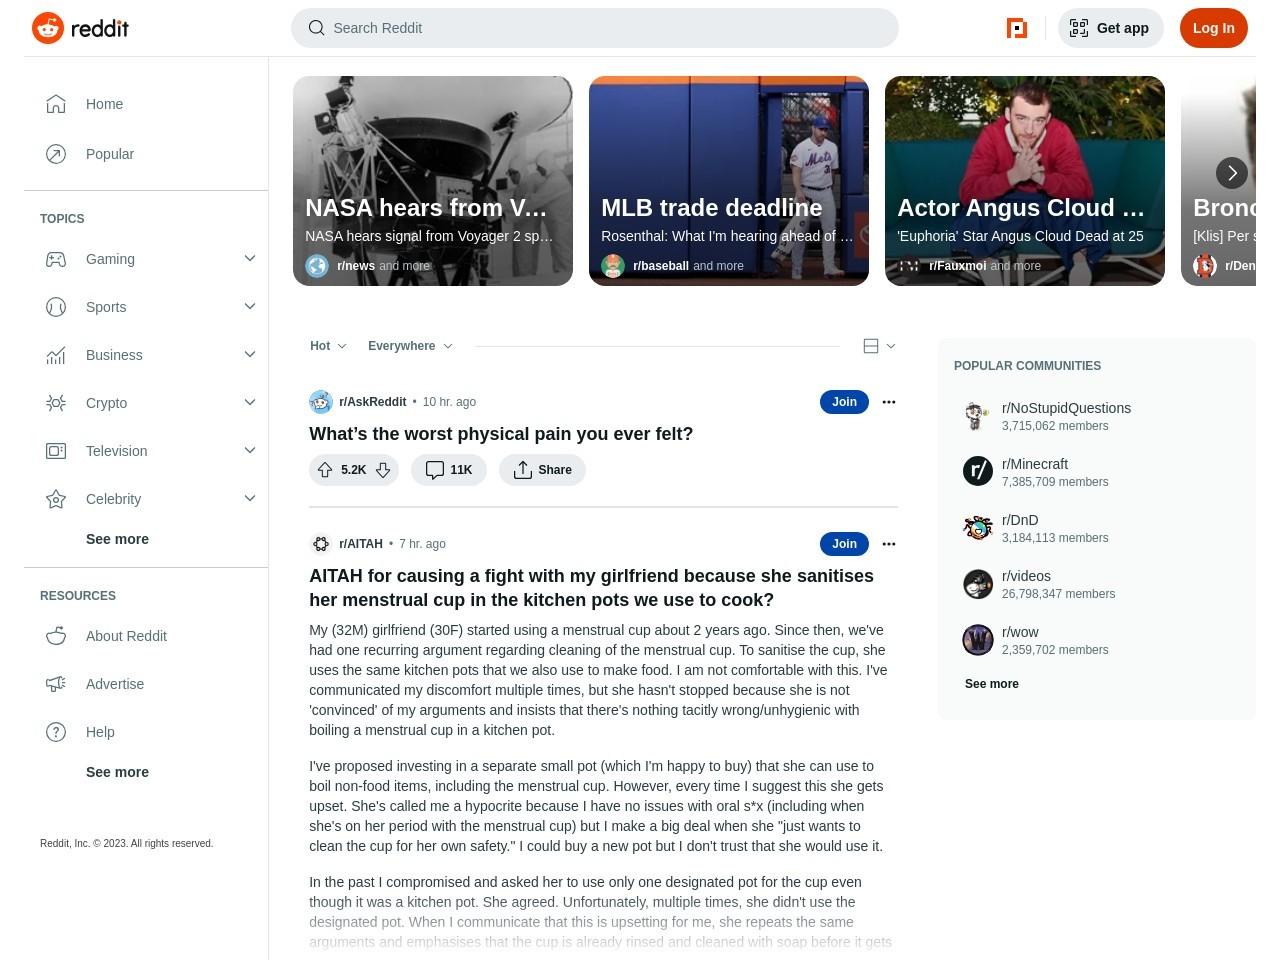 Reddit, Information Technology World